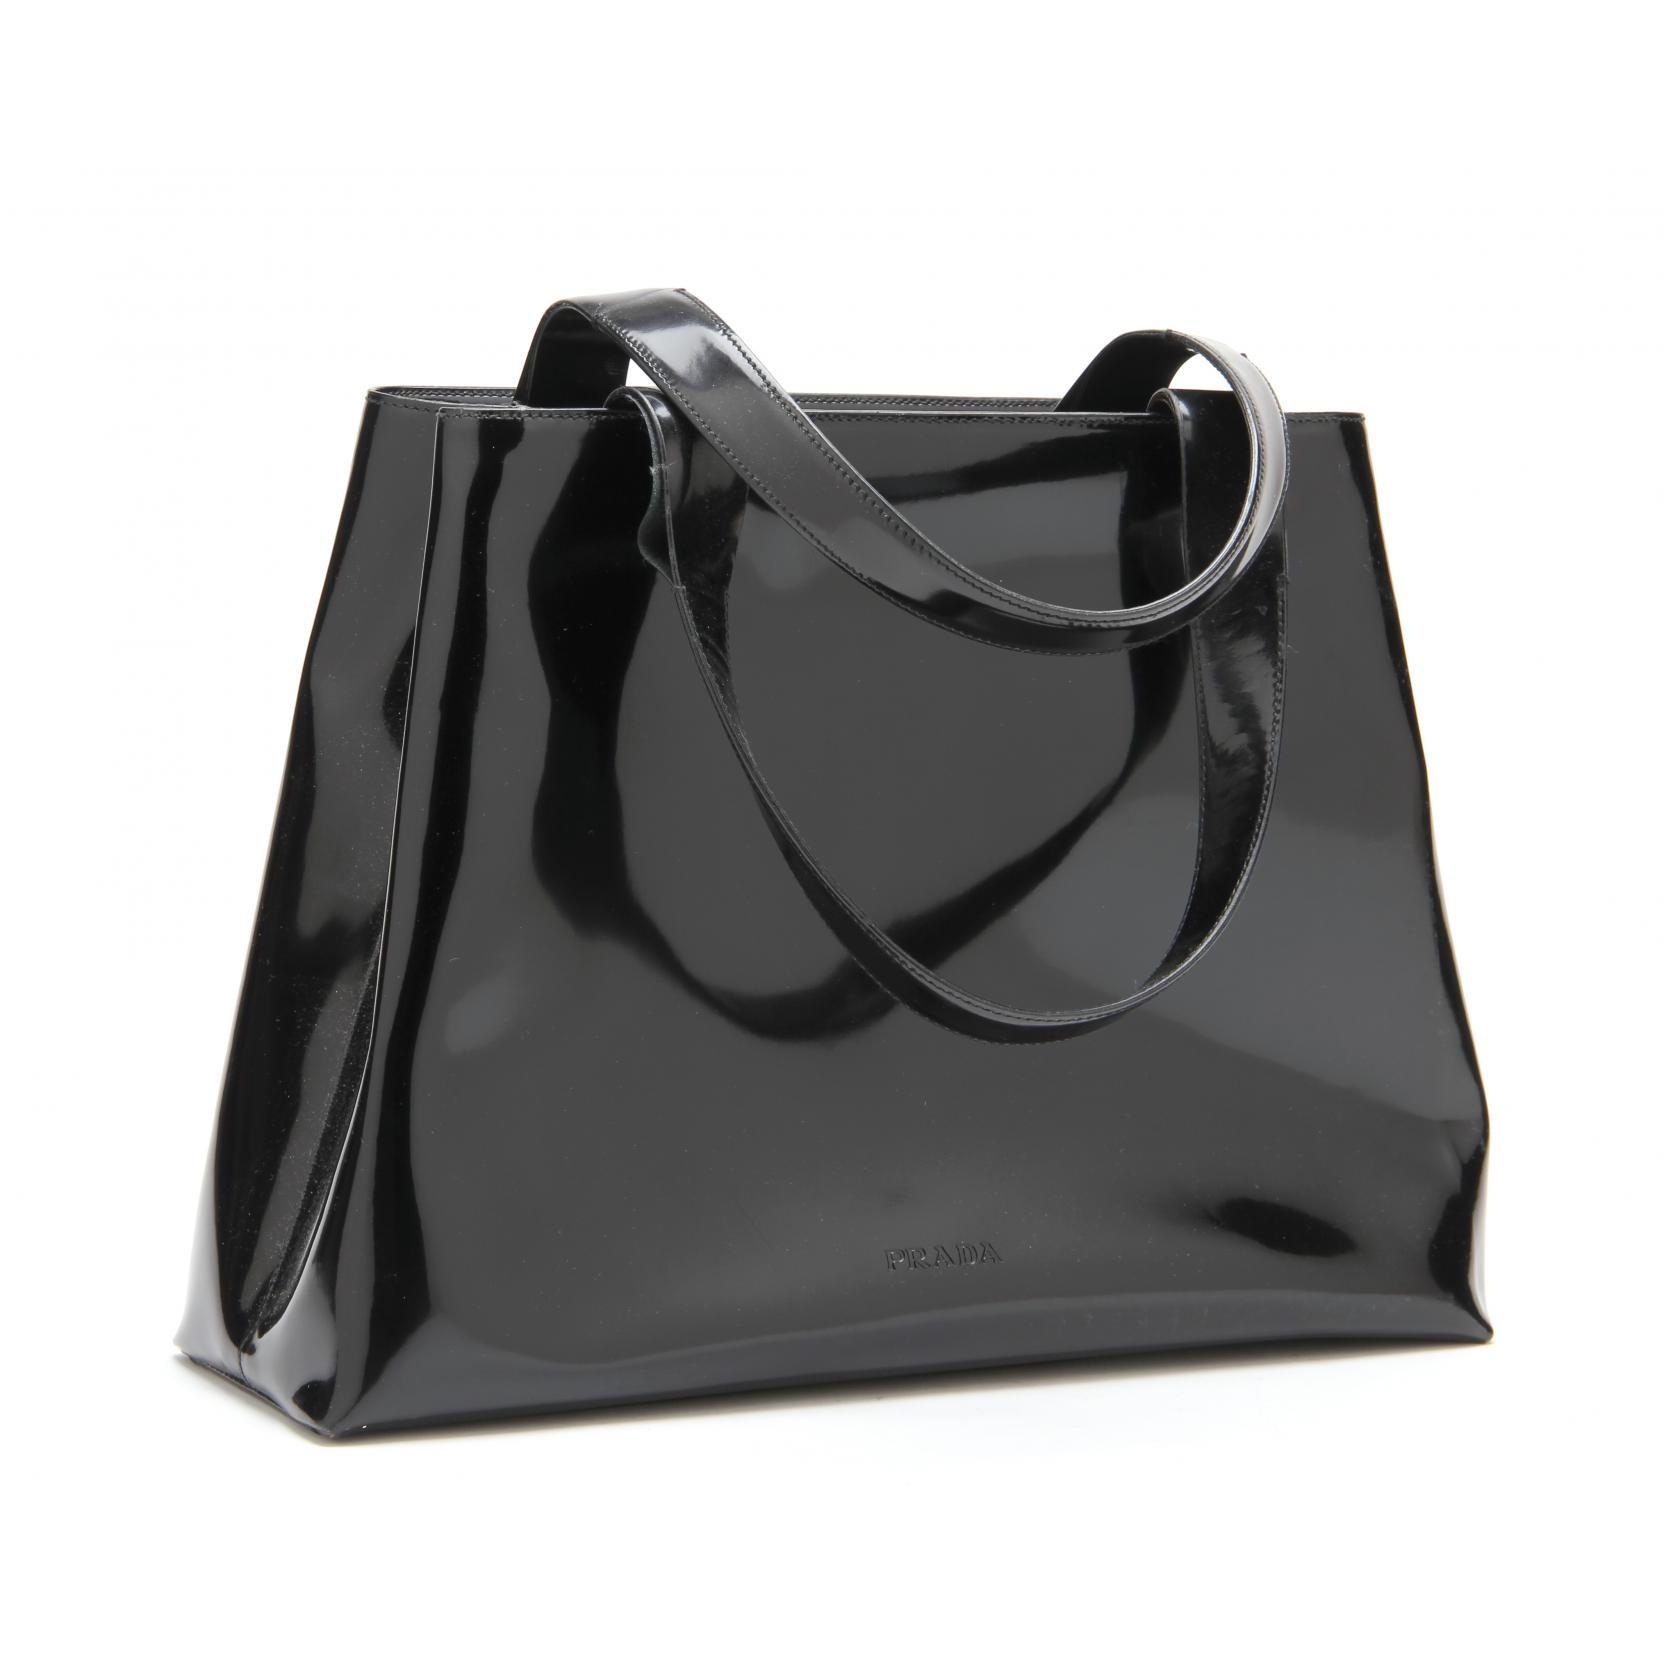 black-patent-leather-tote-prada